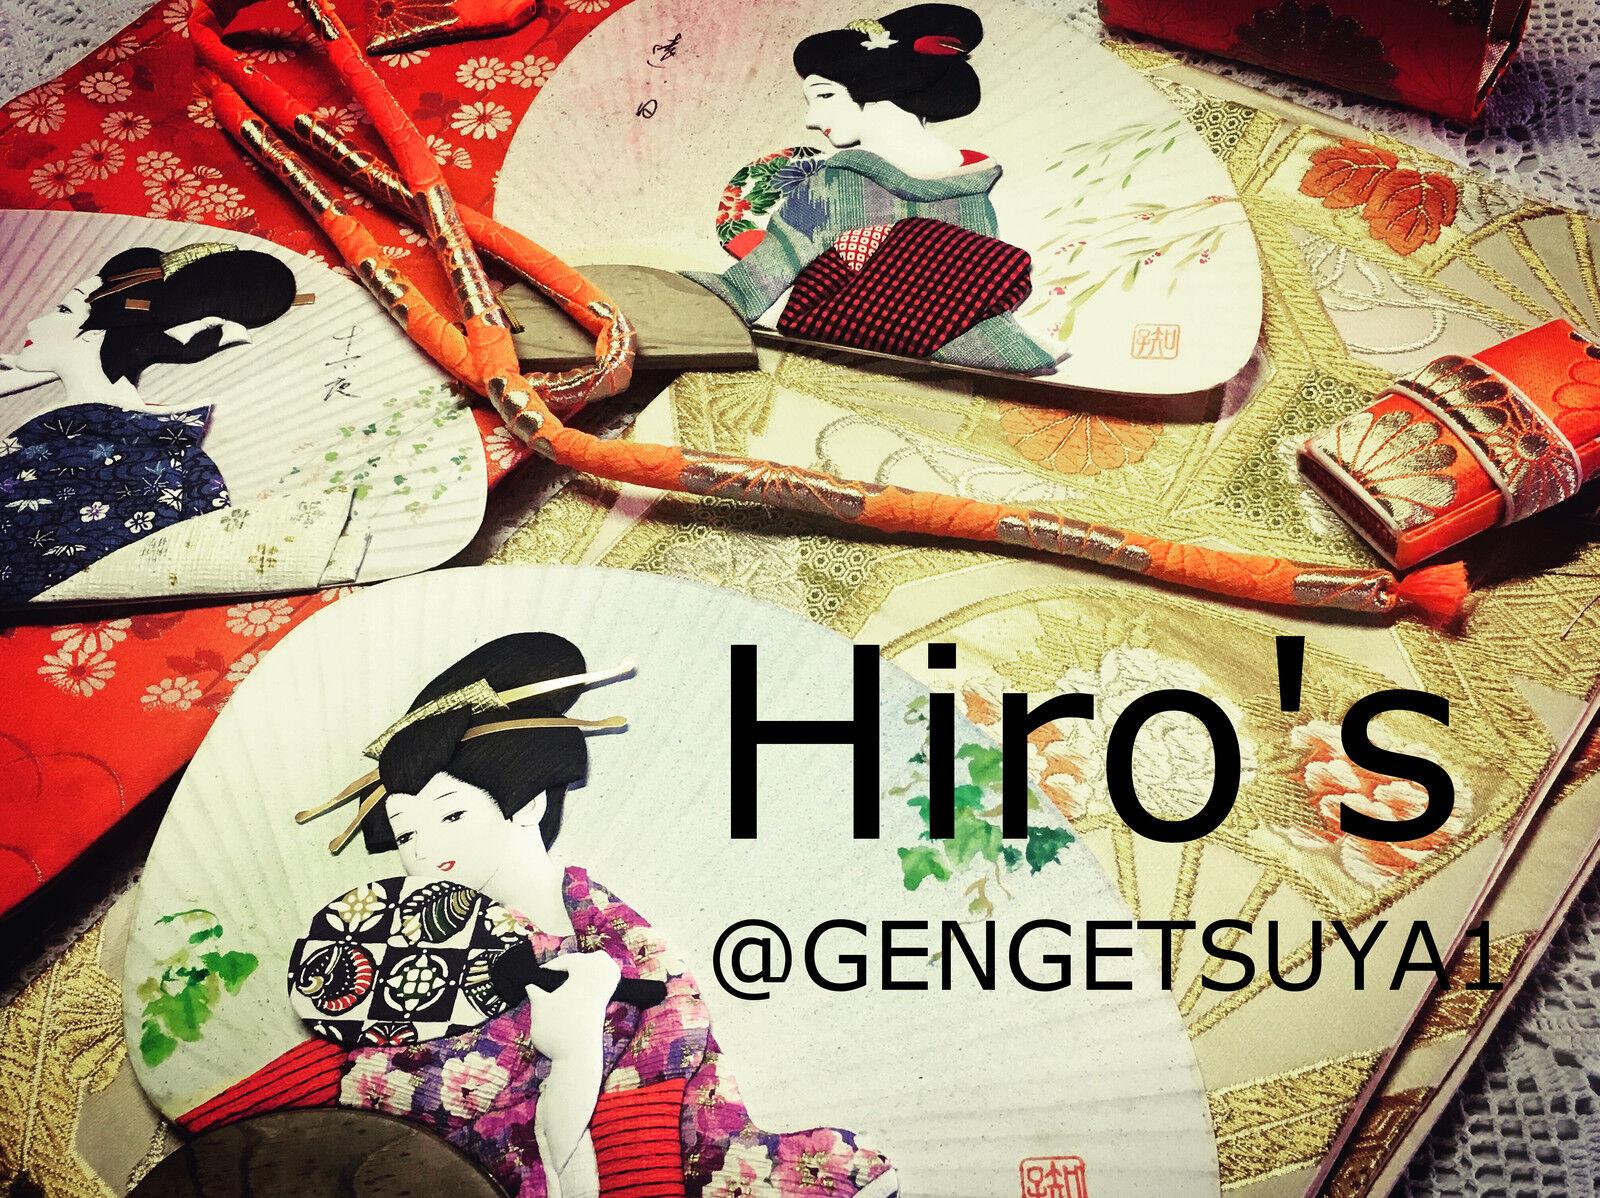 HIRO's Shop & gallery